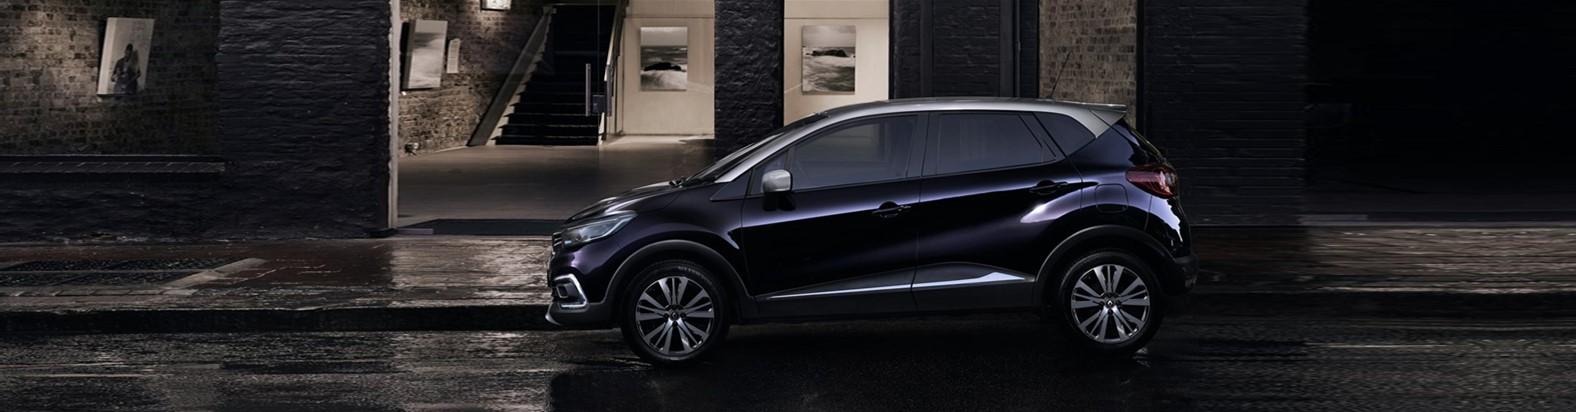 Renault – 2018 Captur